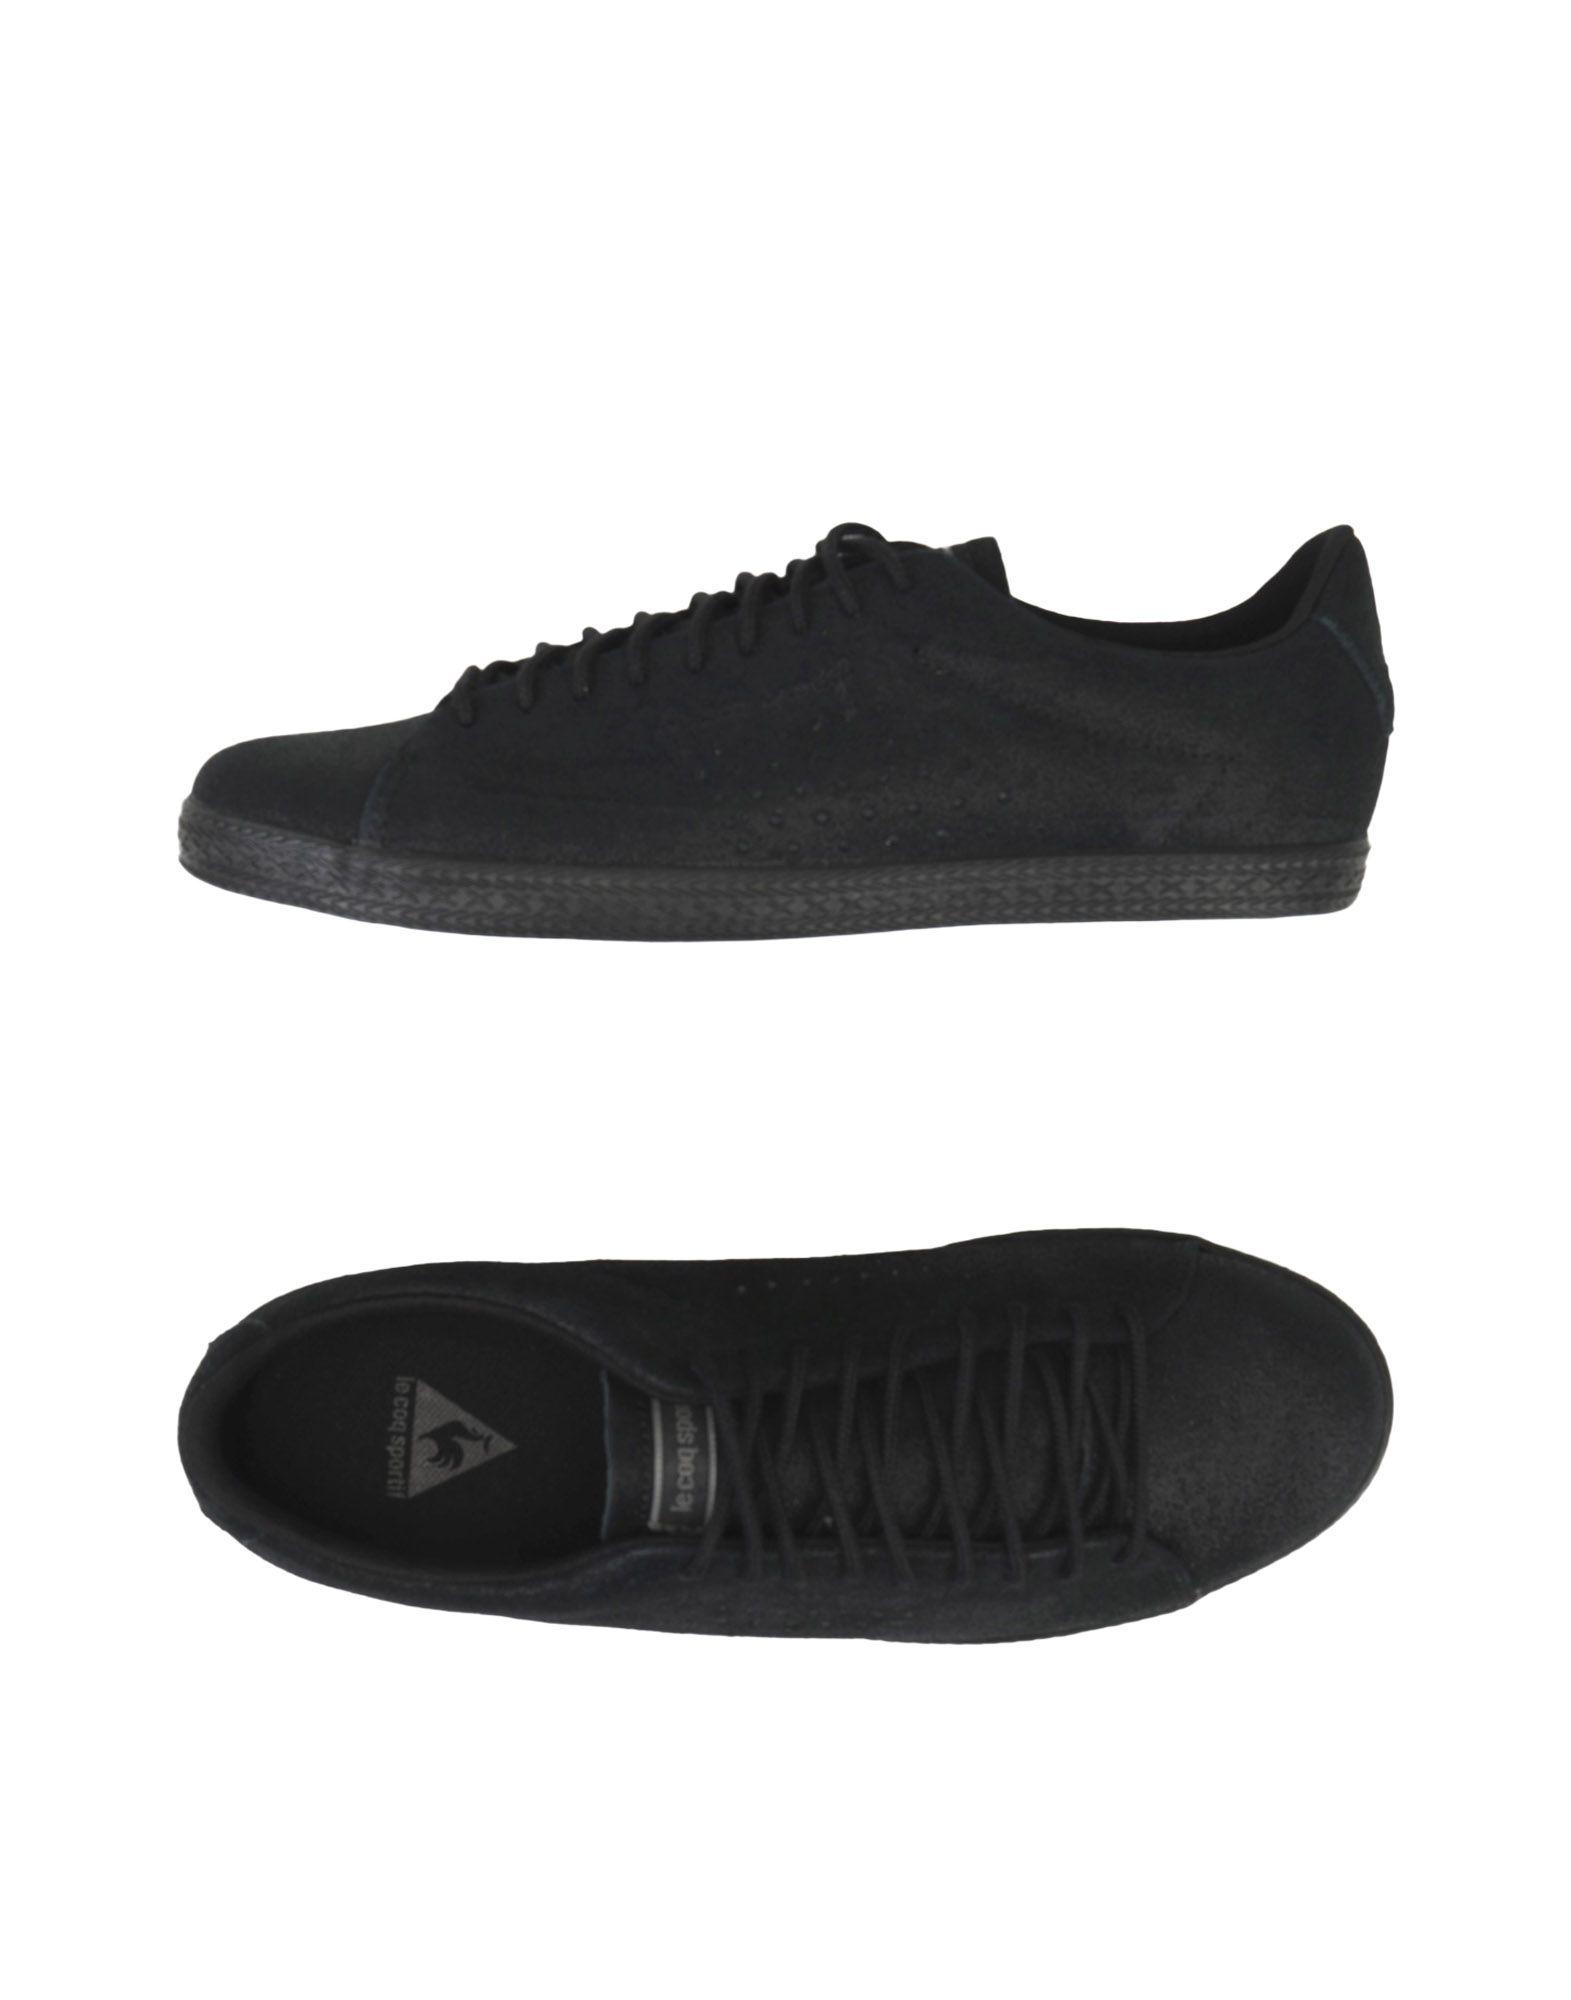 Le Coq Sportif Charline Metallic Suede  11340684FI Gute Qualität beliebte Schuhe